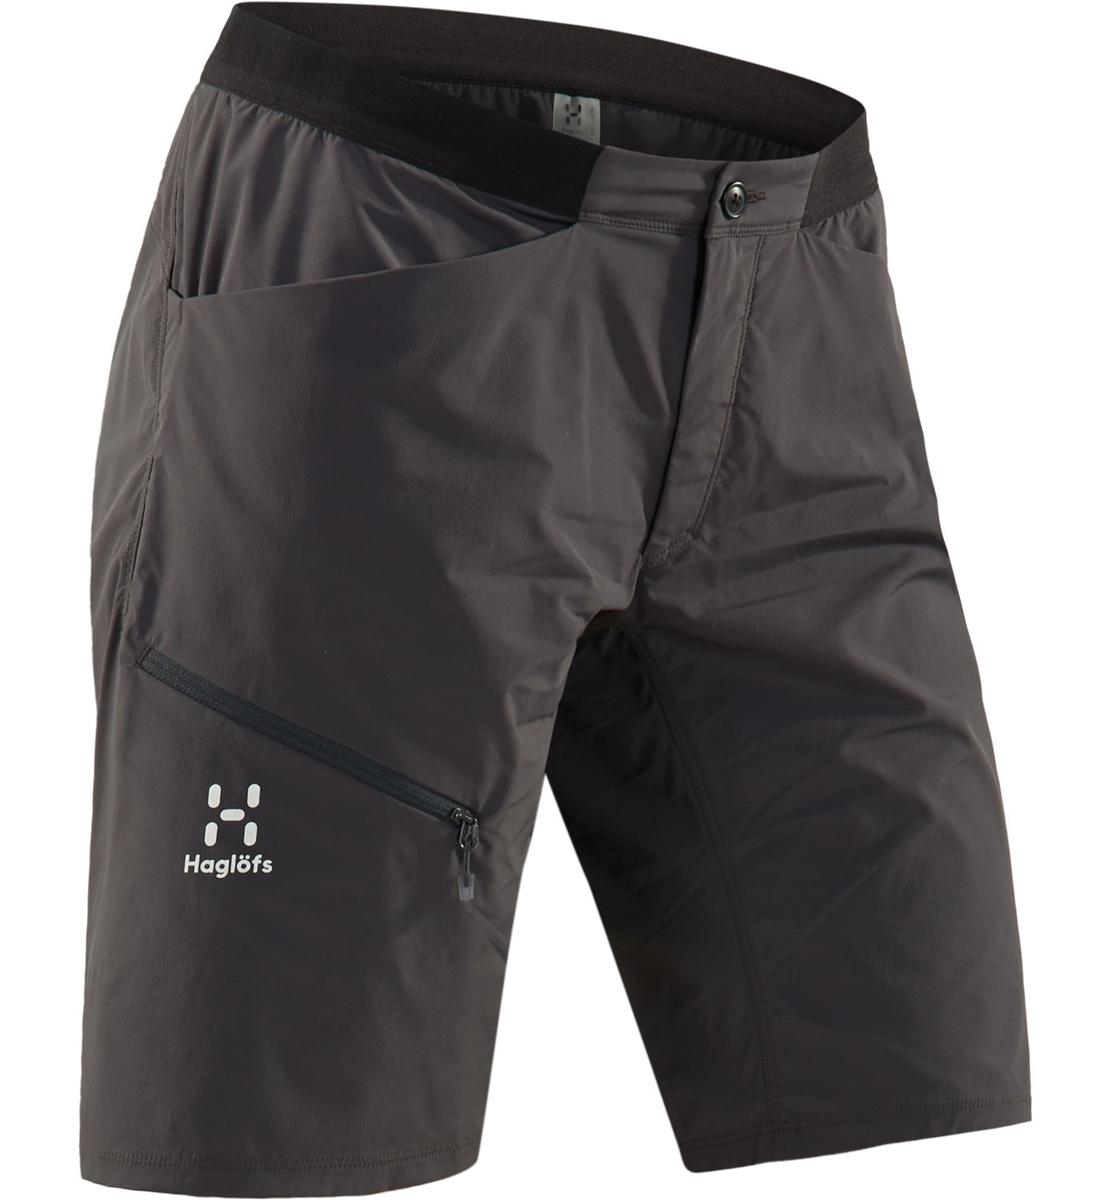 7987ef1caf9 Haglöfs L.I.M Fuse Shorts Women slate- Nava Sport - Vi selger klær ...